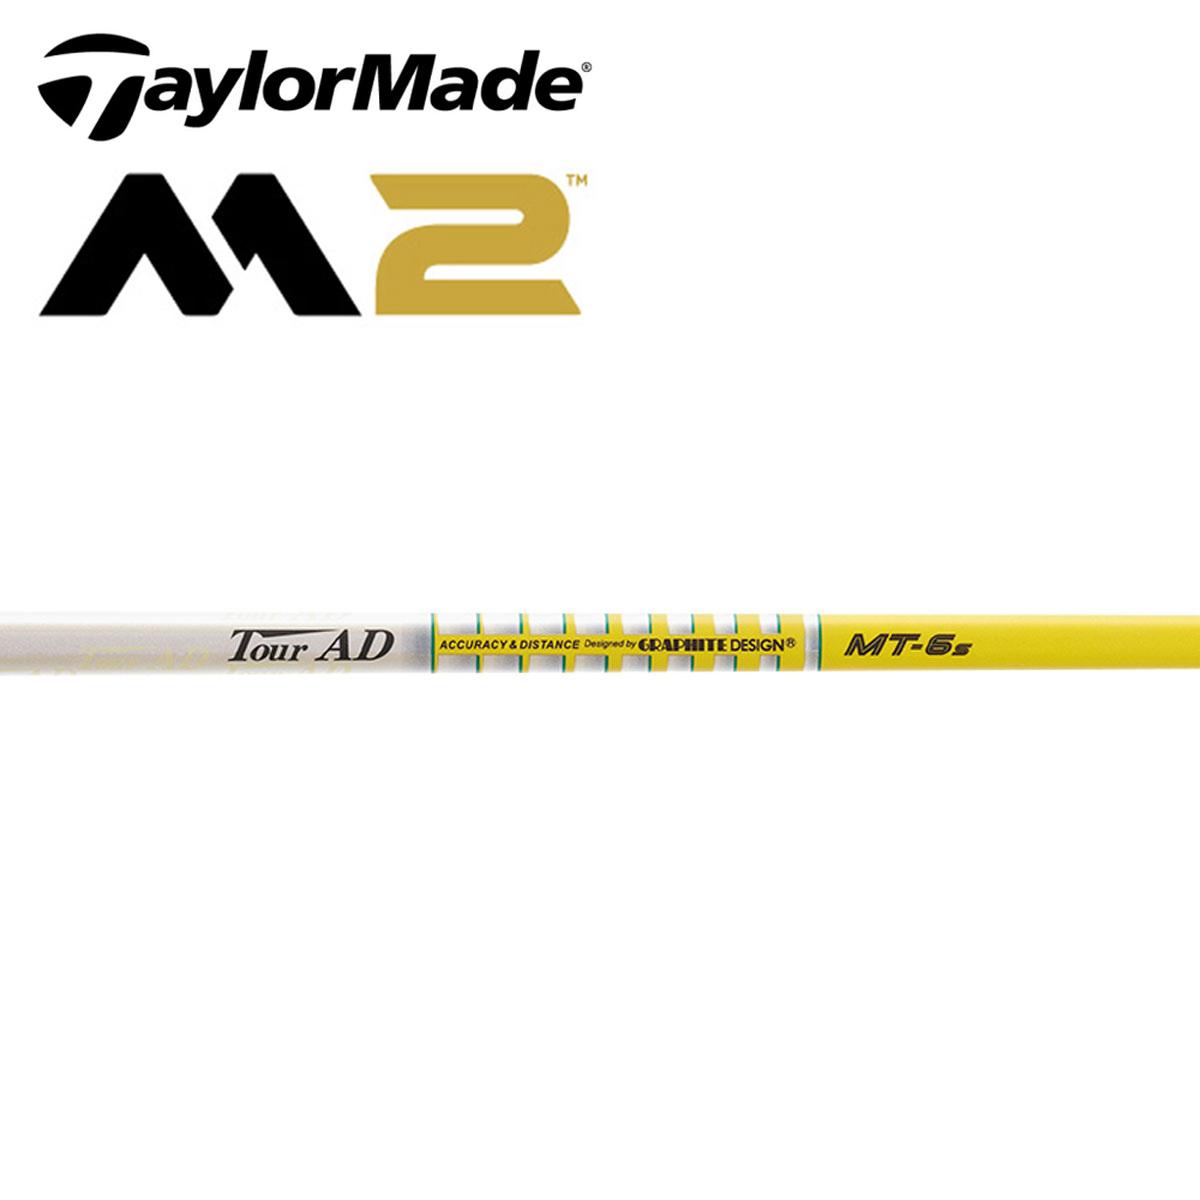 Tour AD MTシリーズ M2 ドライバーロフト9.5度用スリーブ付きシャフト 2016年モデル【テーラーメイド専用】